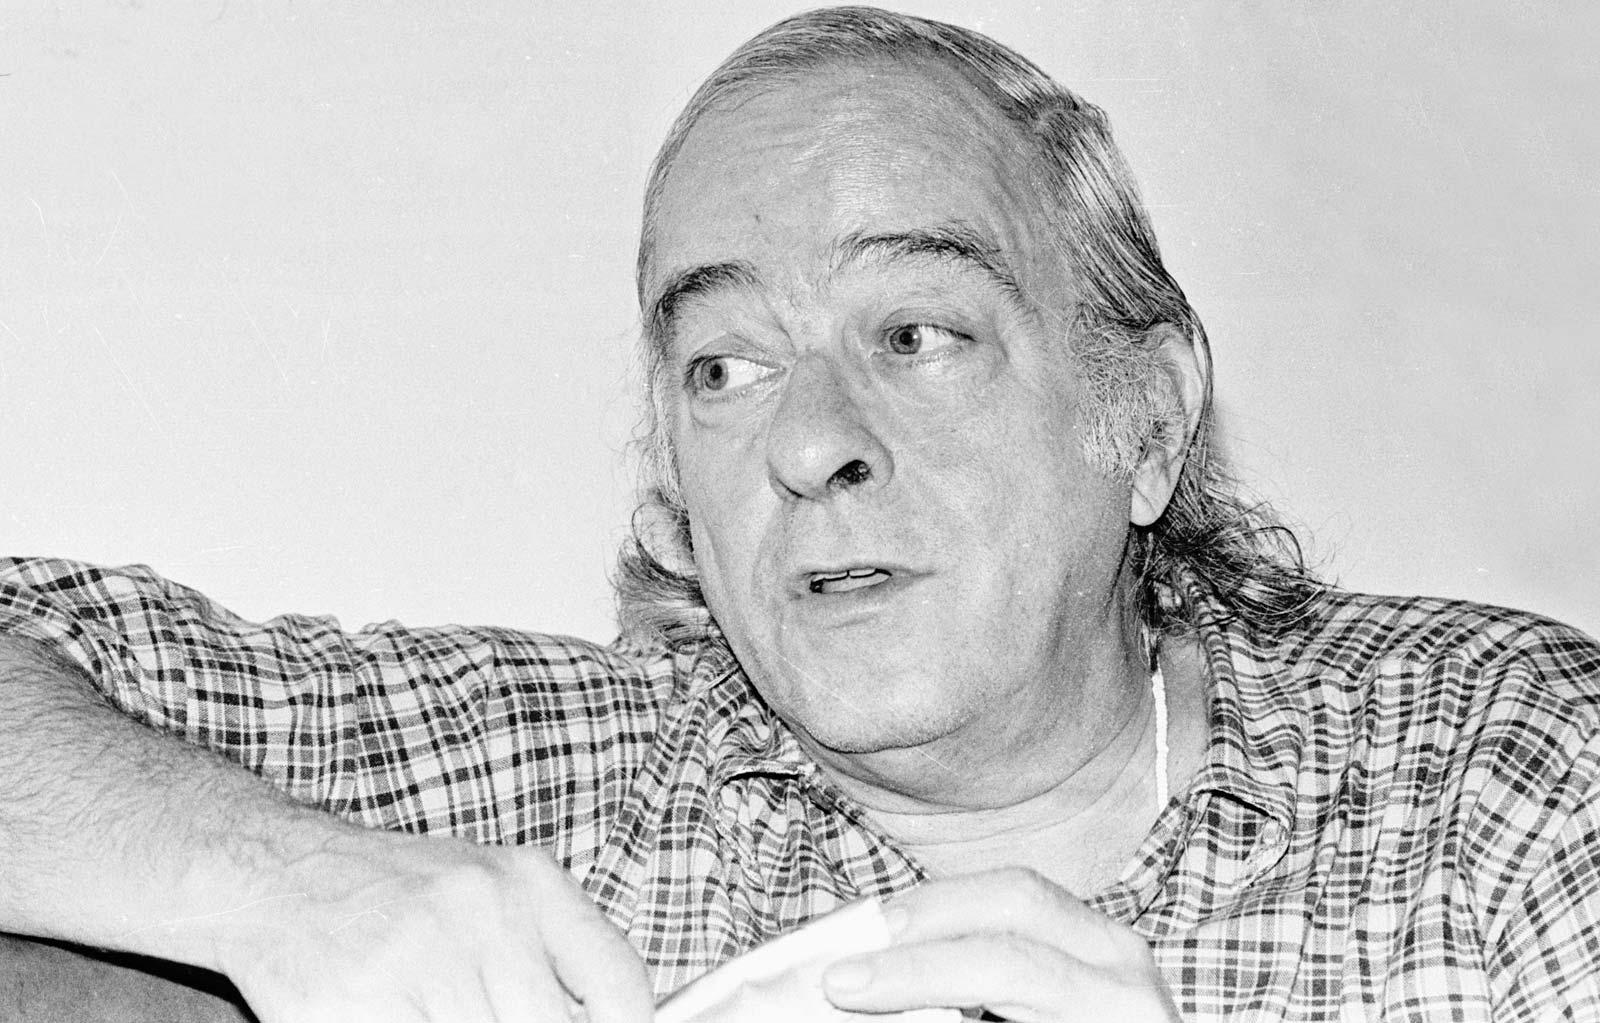 Vinicius-de-Moraes-1972